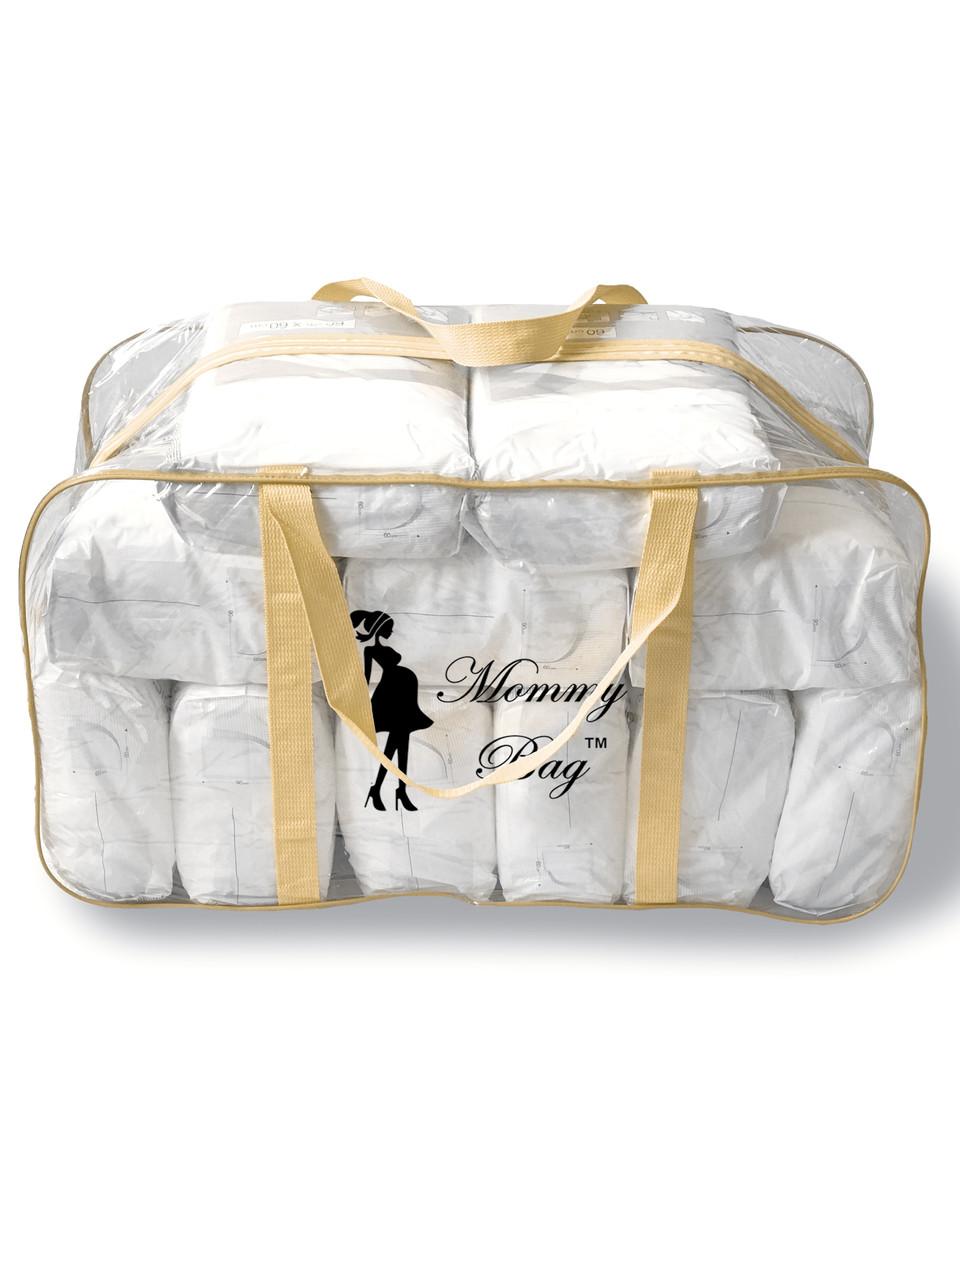 Сумка прозрачная в роддом Mommy Bag - XL - 65*35*30 см Бежеая